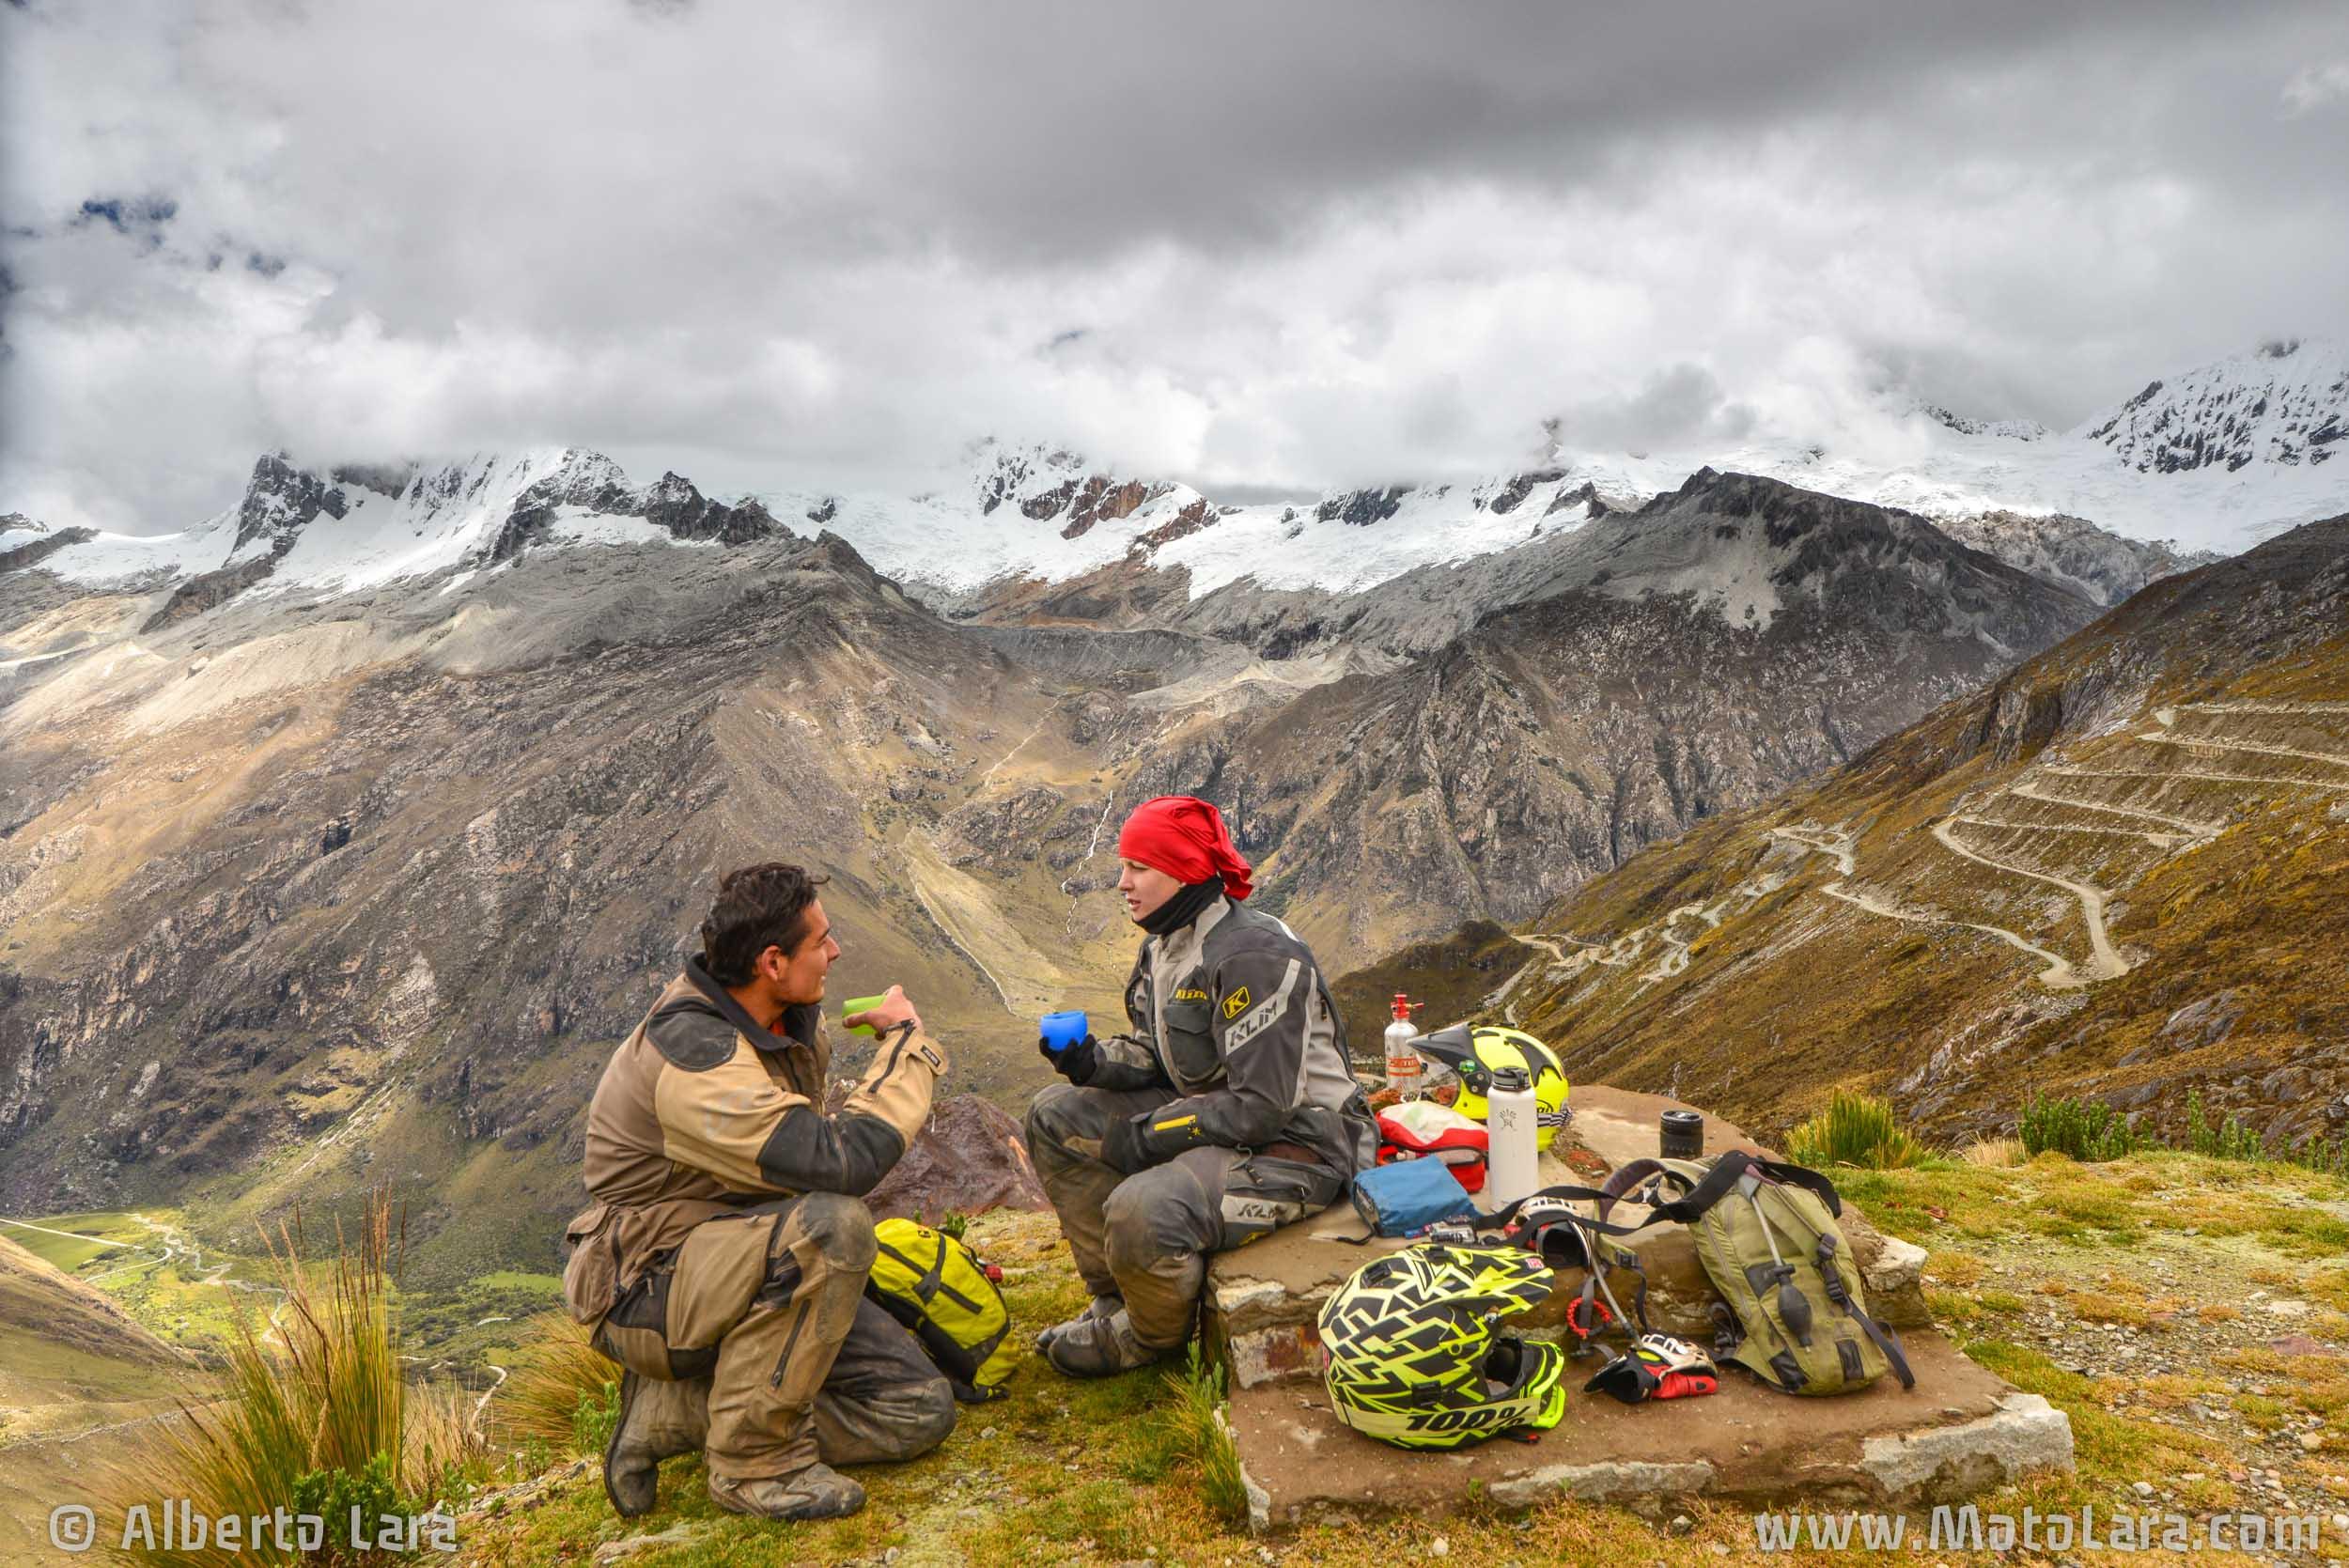 Having hot tea at Paso Portachuelo, Cordillera Blanca.jpg